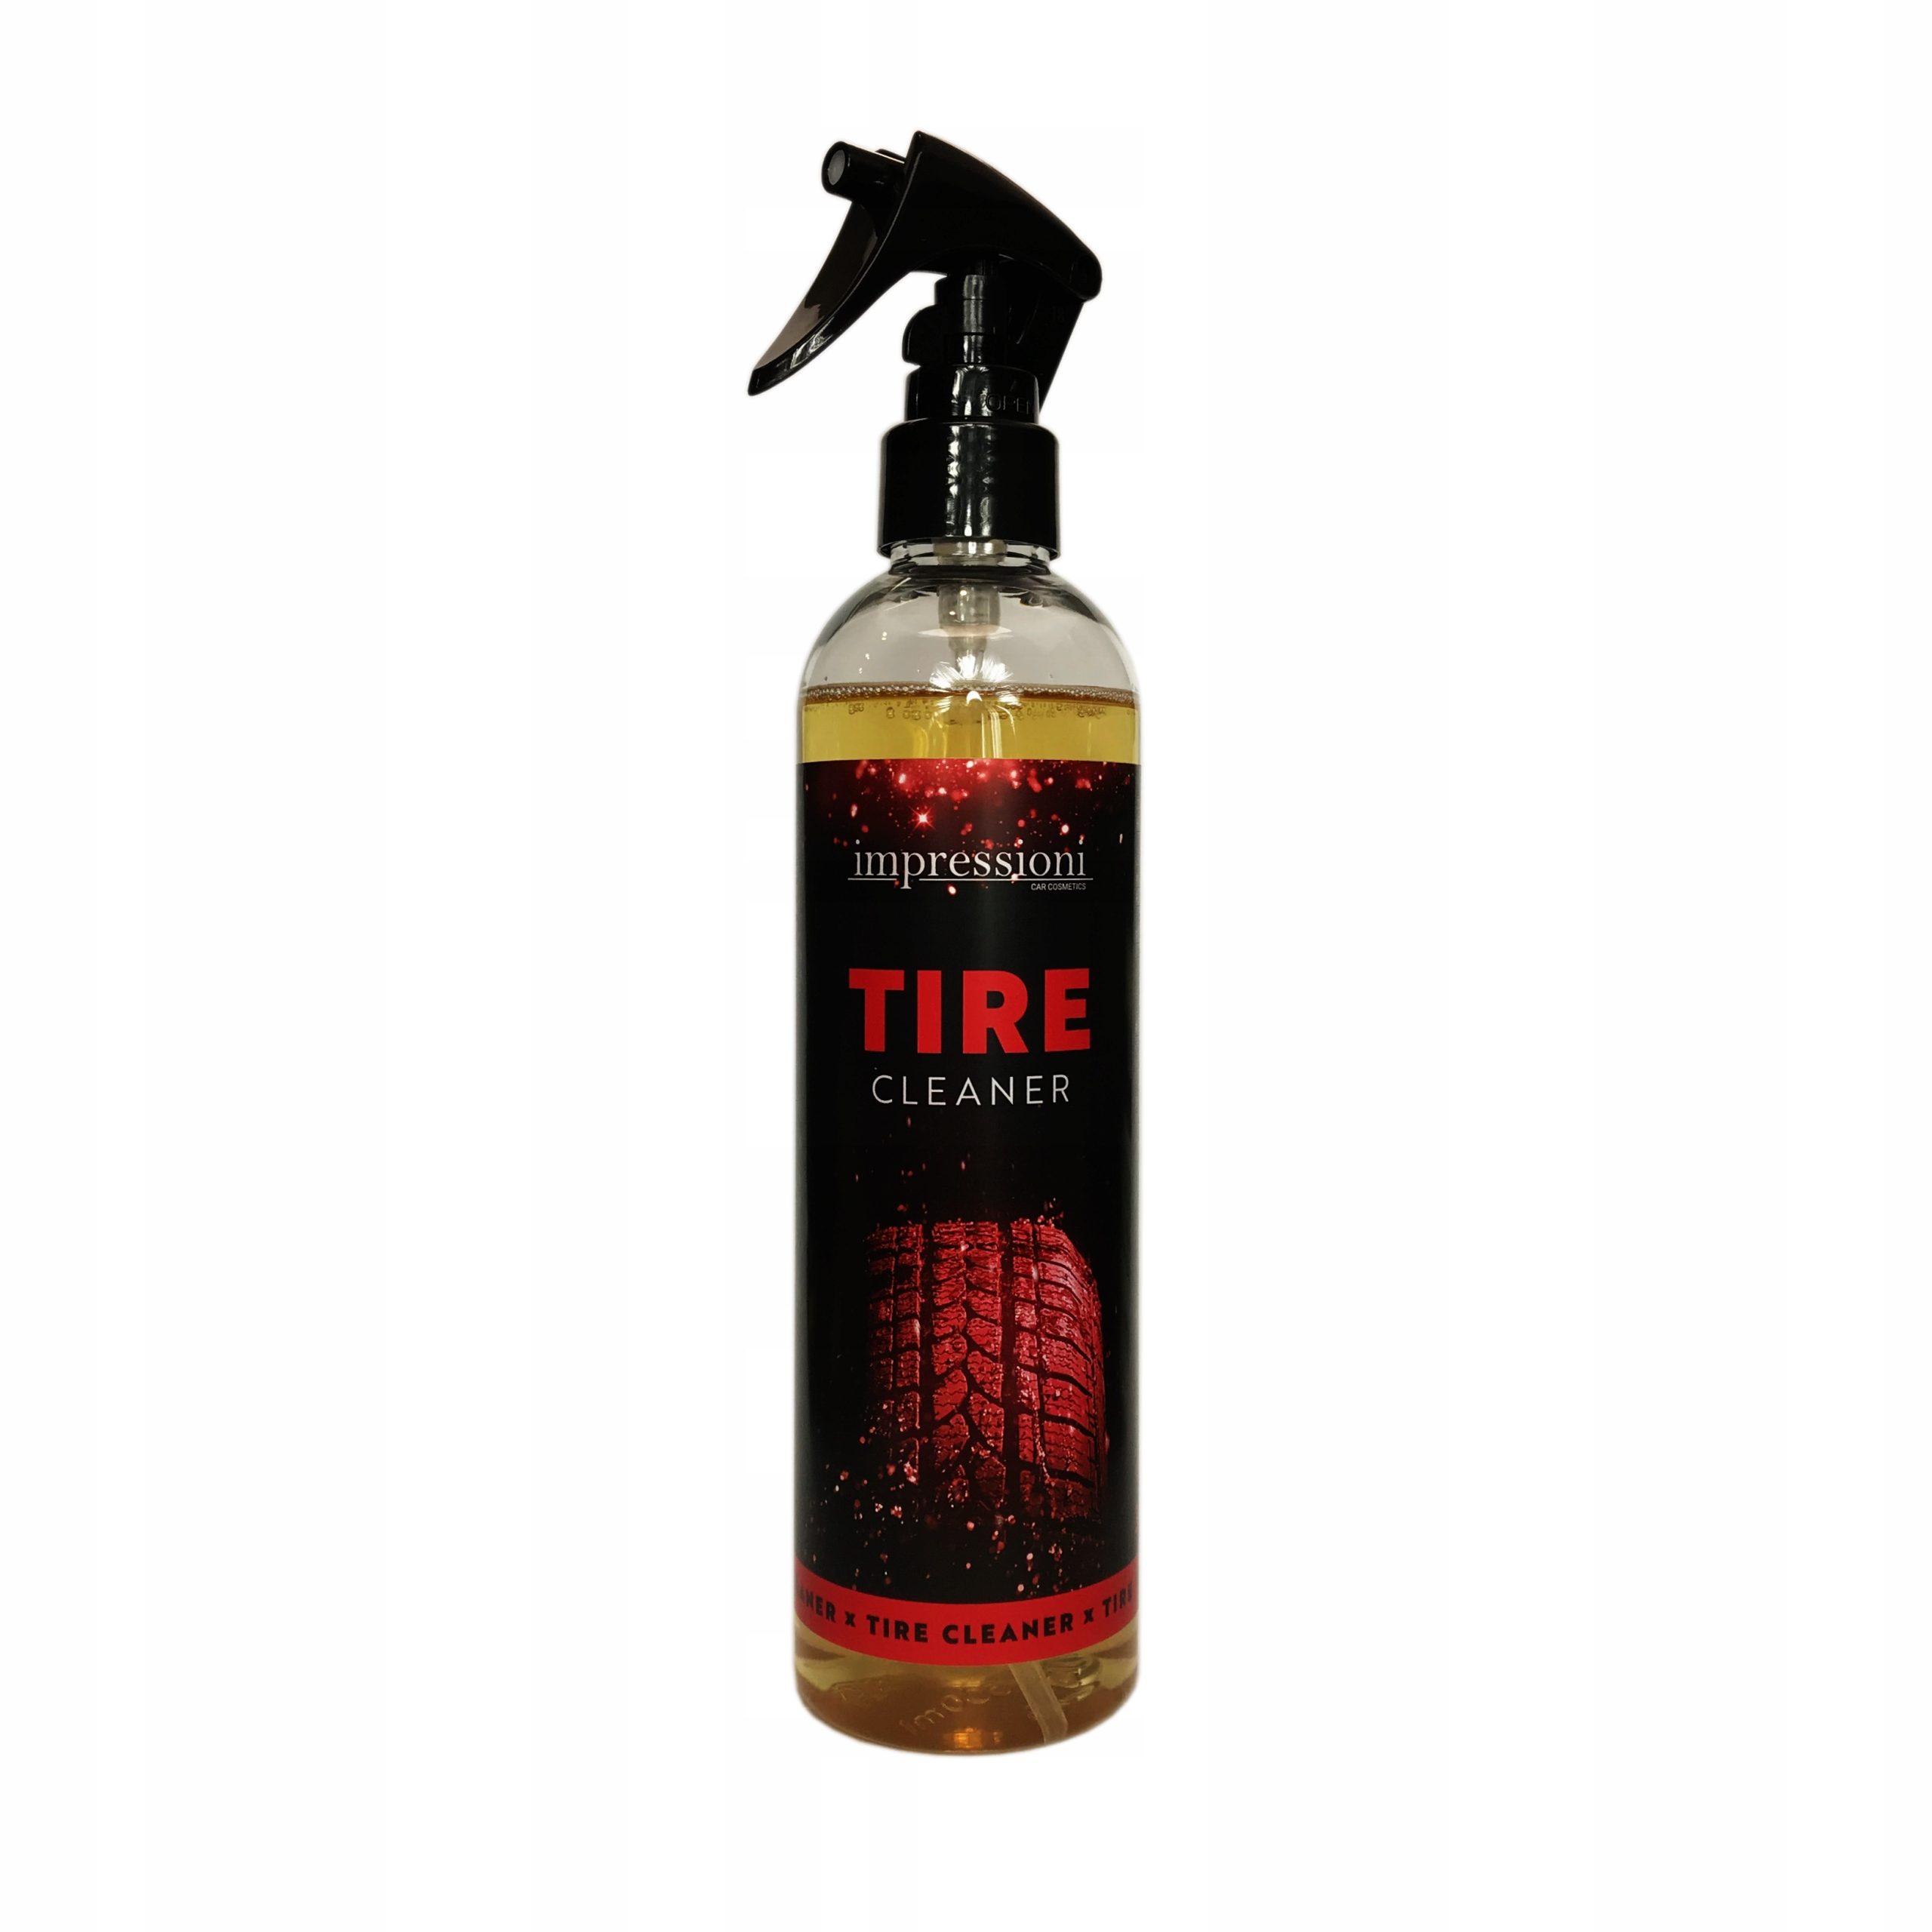 Очистка шин с помощью TIRE CLEANER